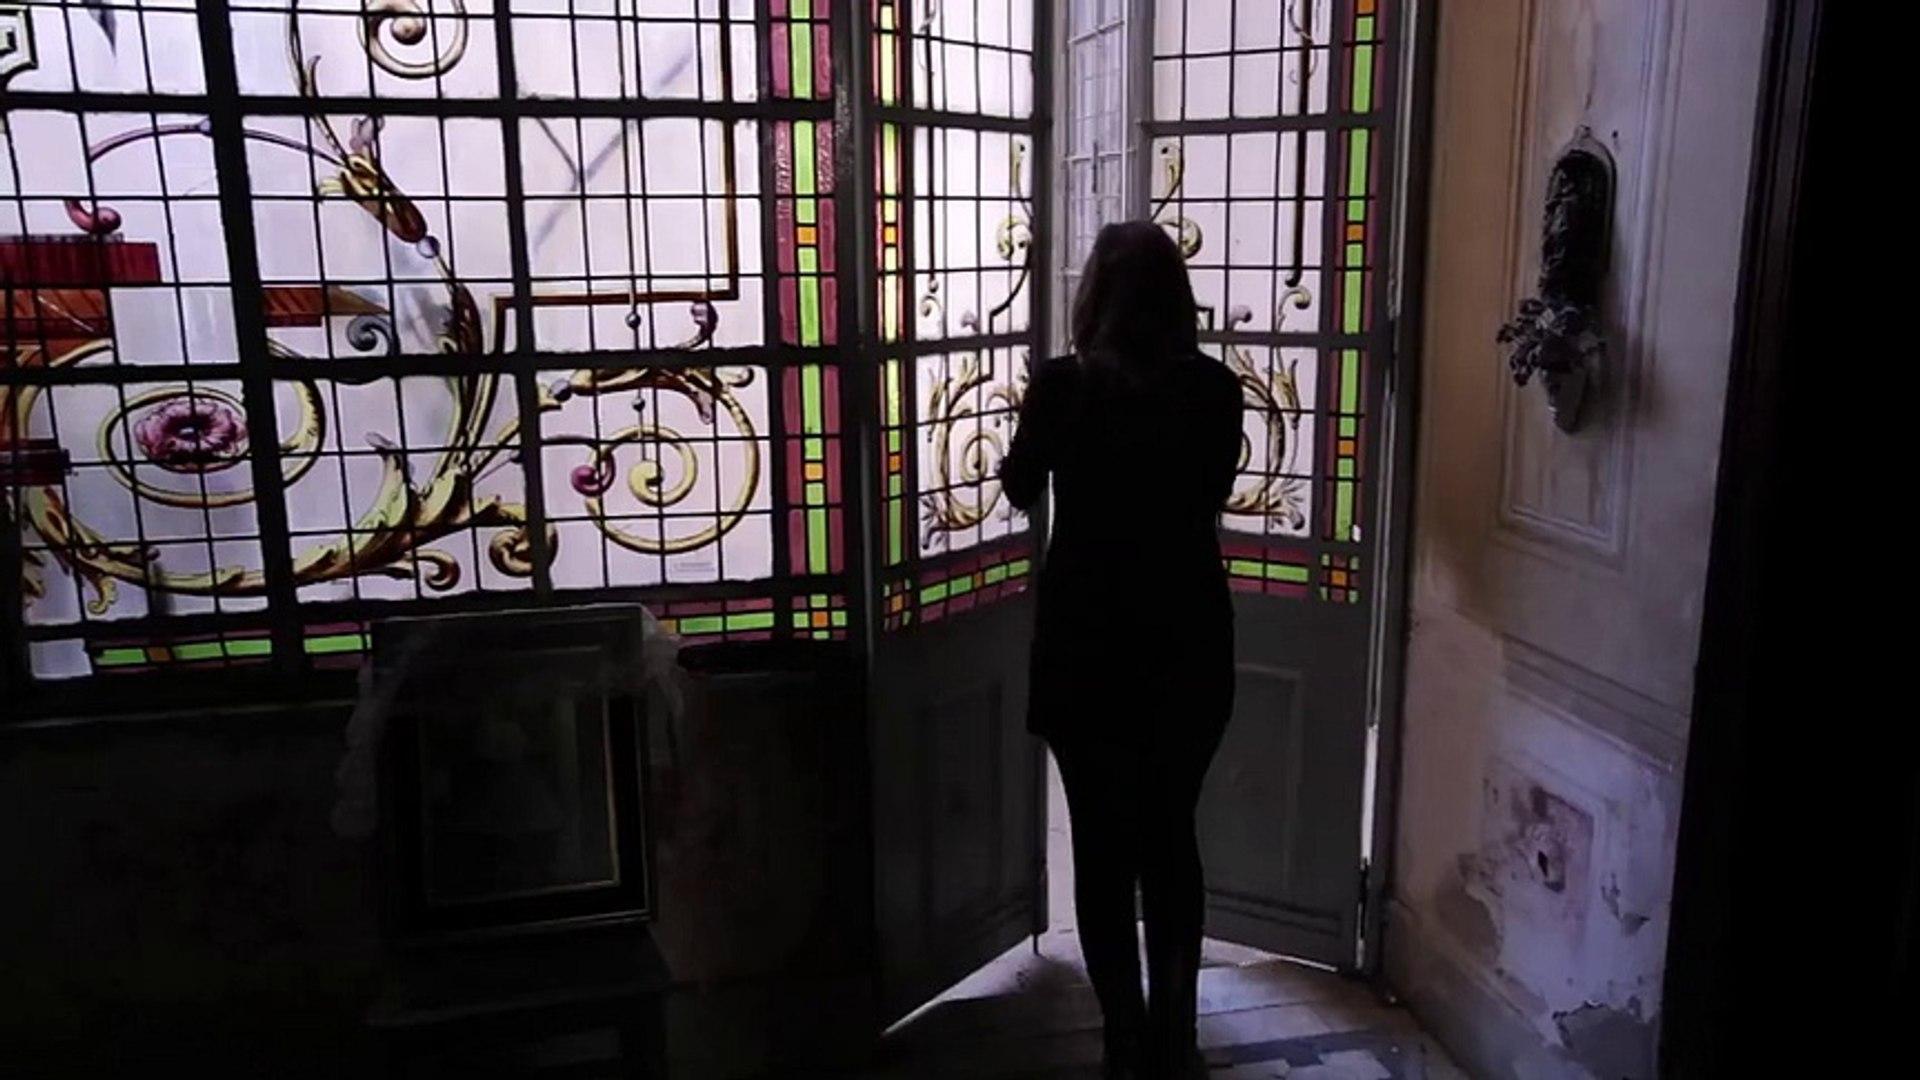 Nicola Costantino, The Artefacta, Trailer Movie, Film Production